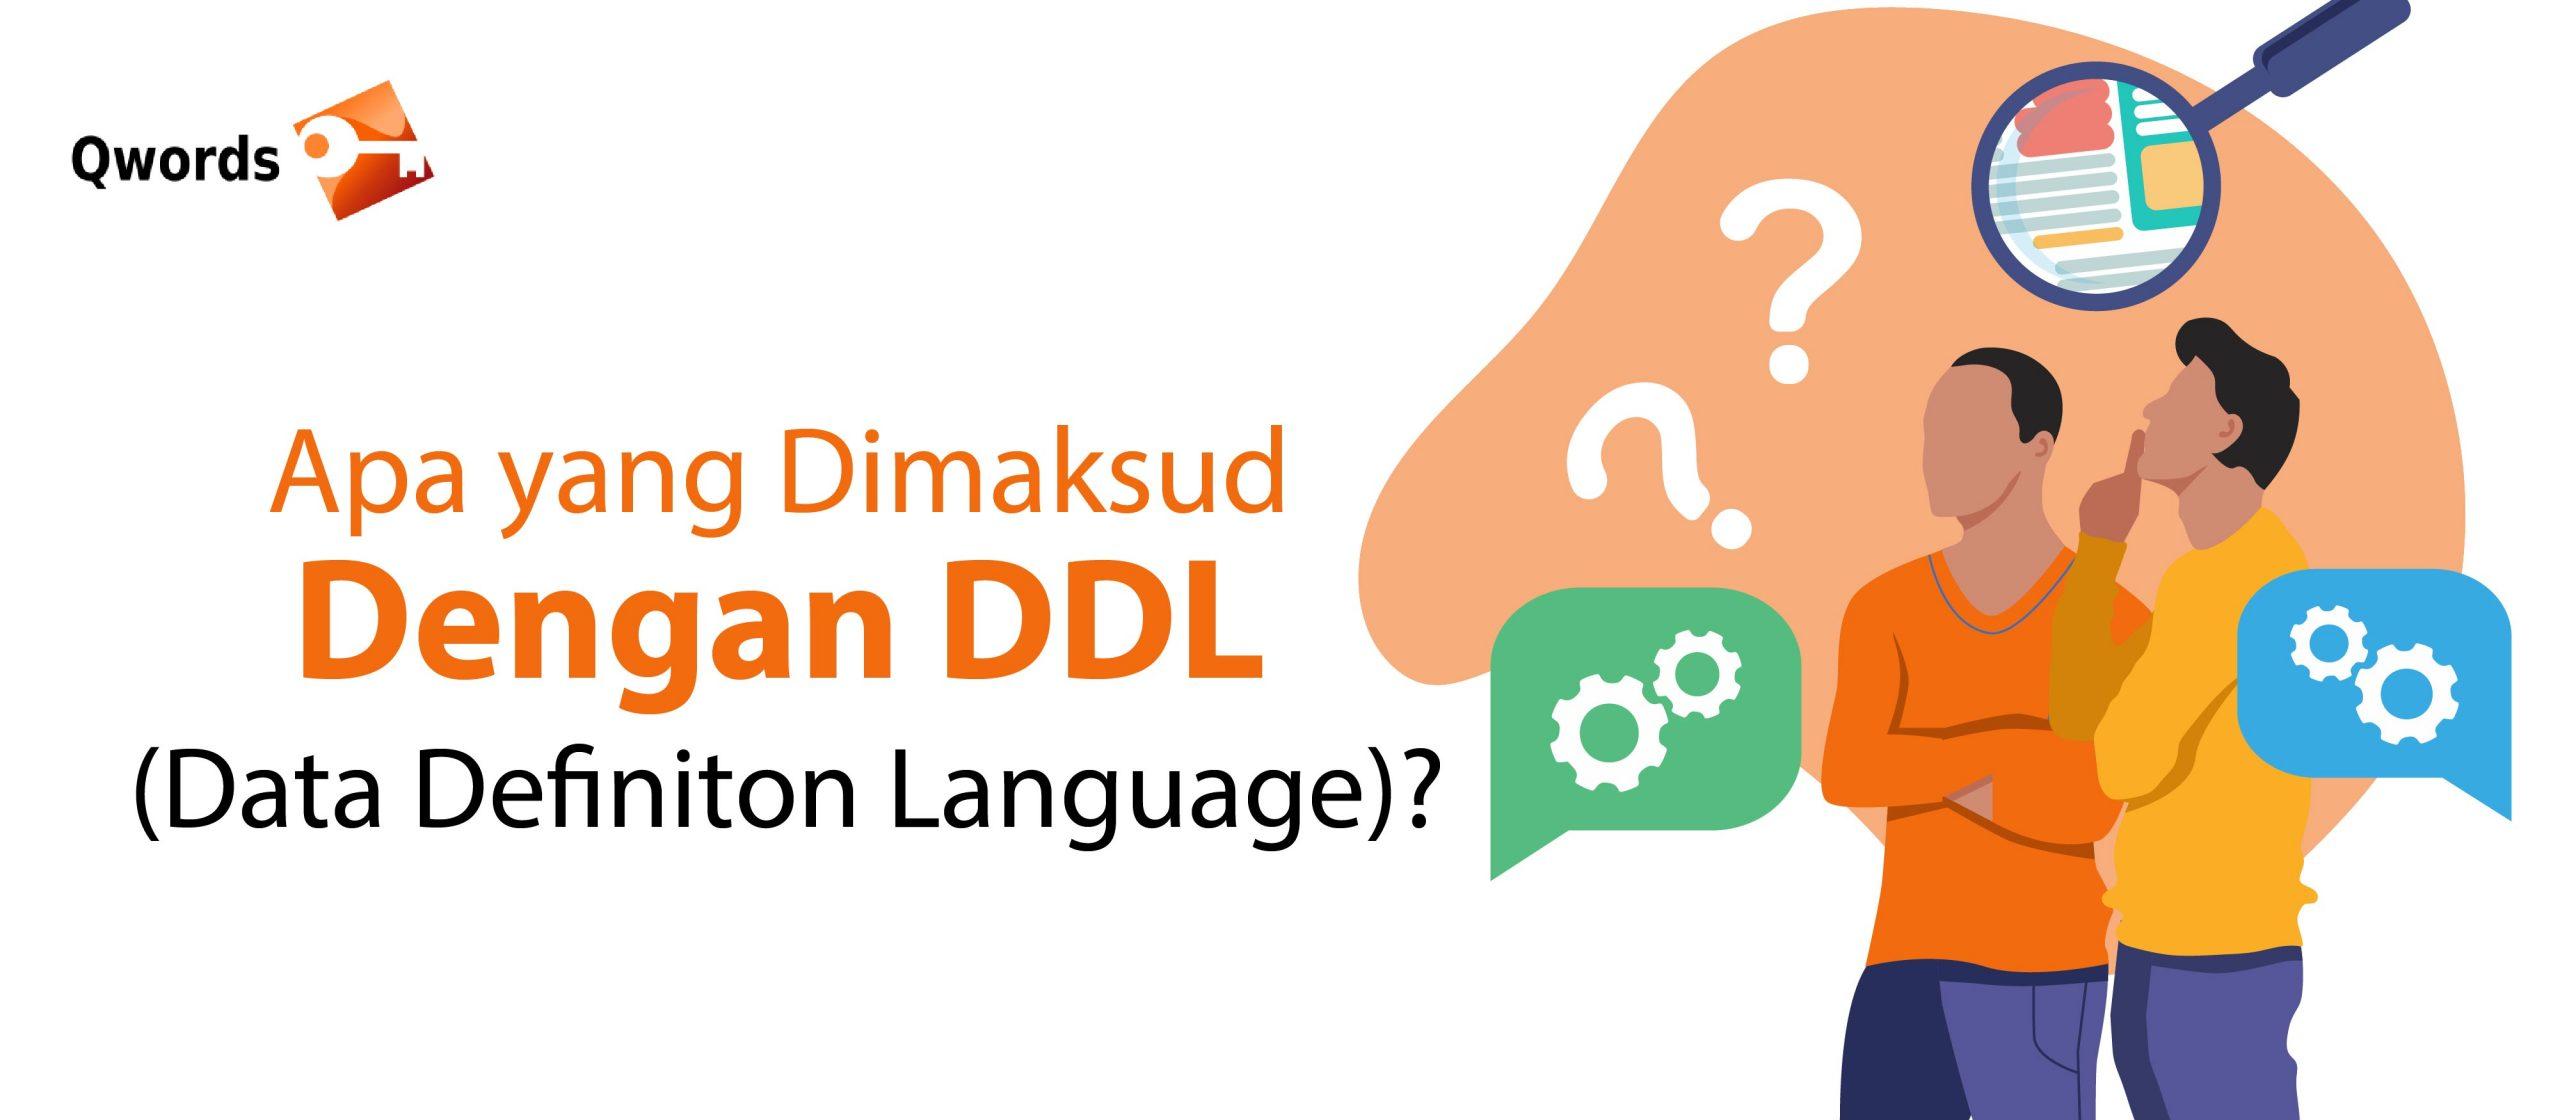 Apa yang Dimaksud Dengan DDL (Data Definiton Language)?